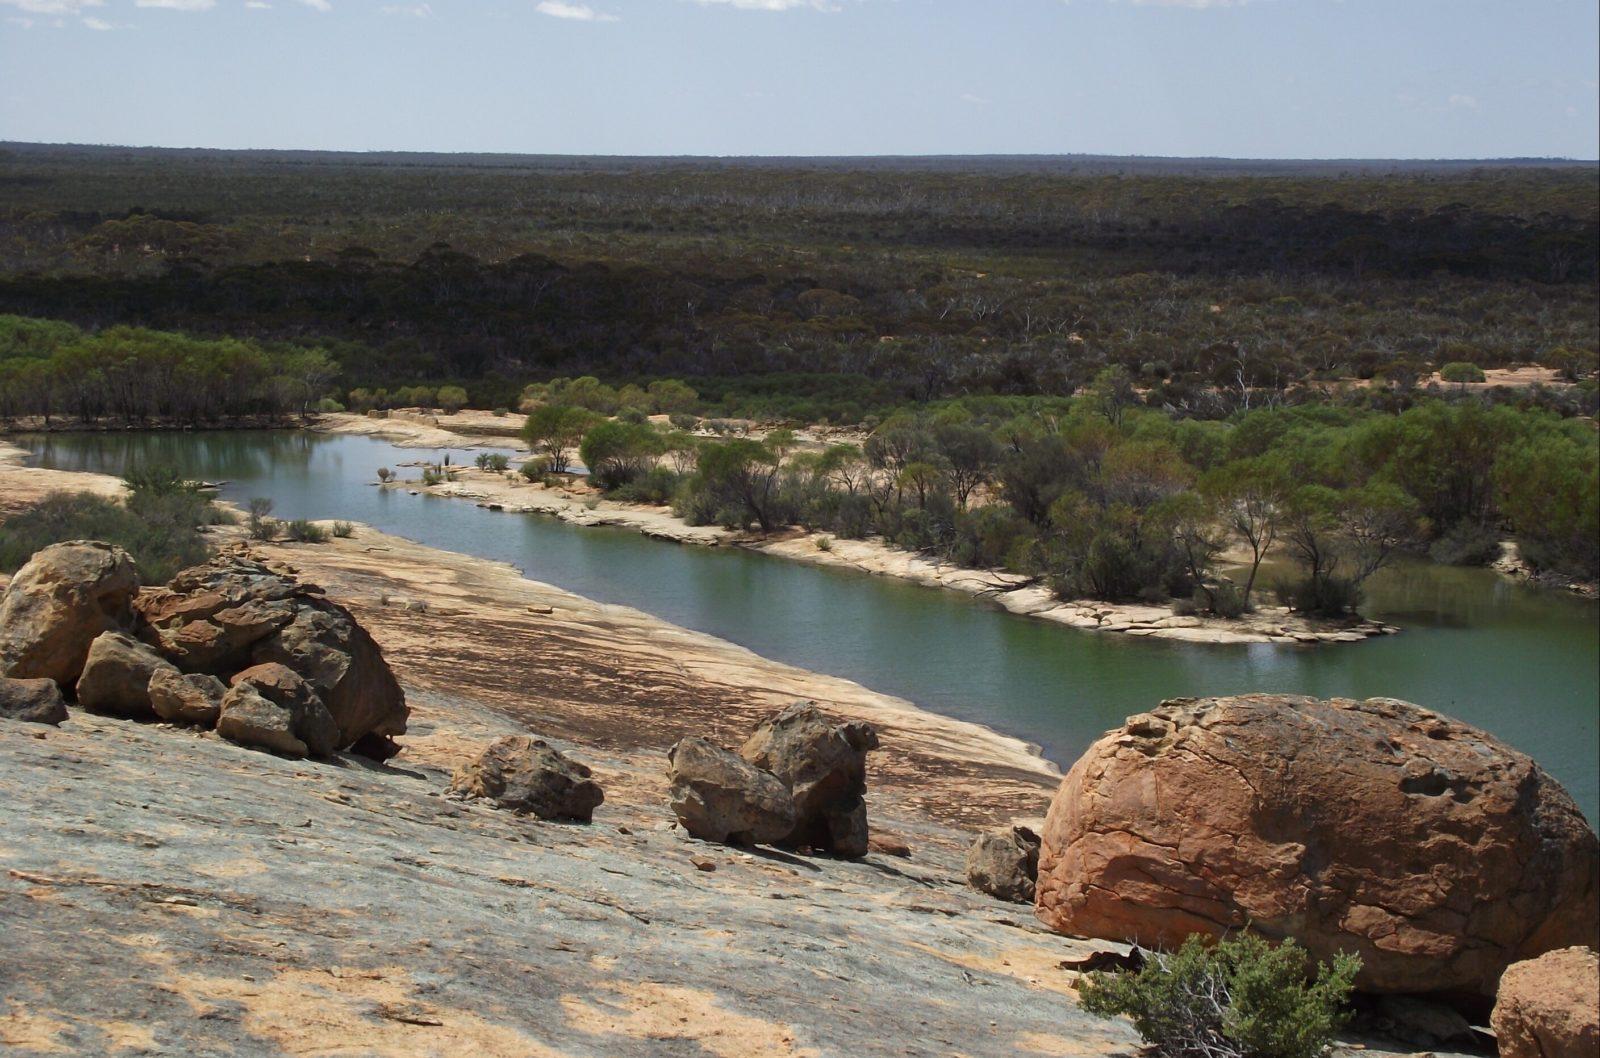 Burra Rock Camp, Burra Rock National Park, Western Australia